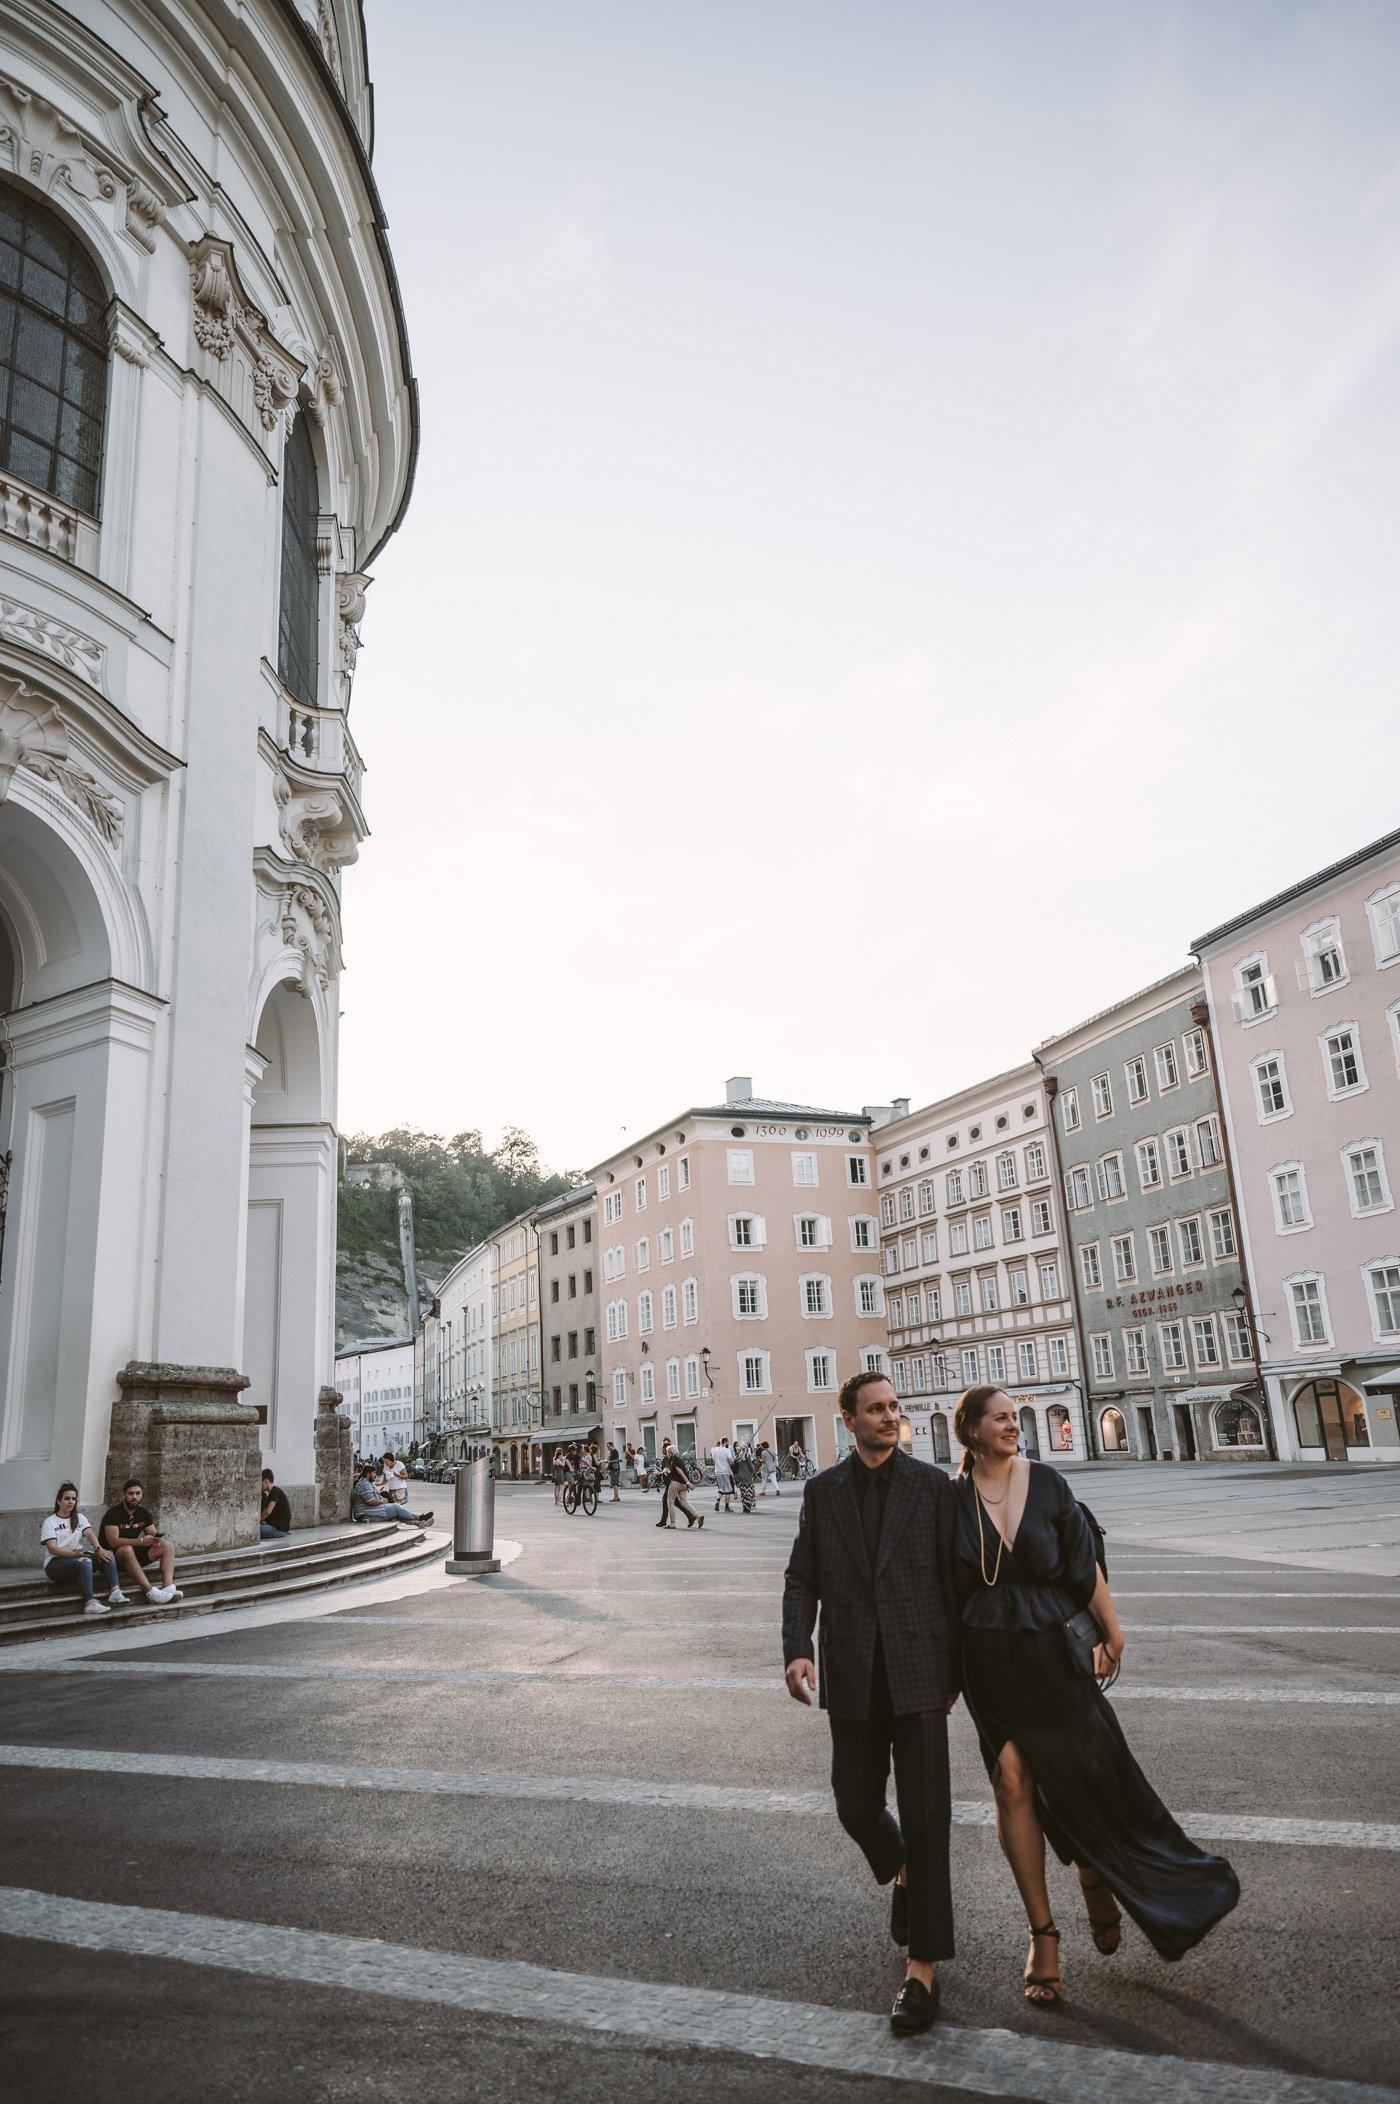 Salzburg Festival 2020